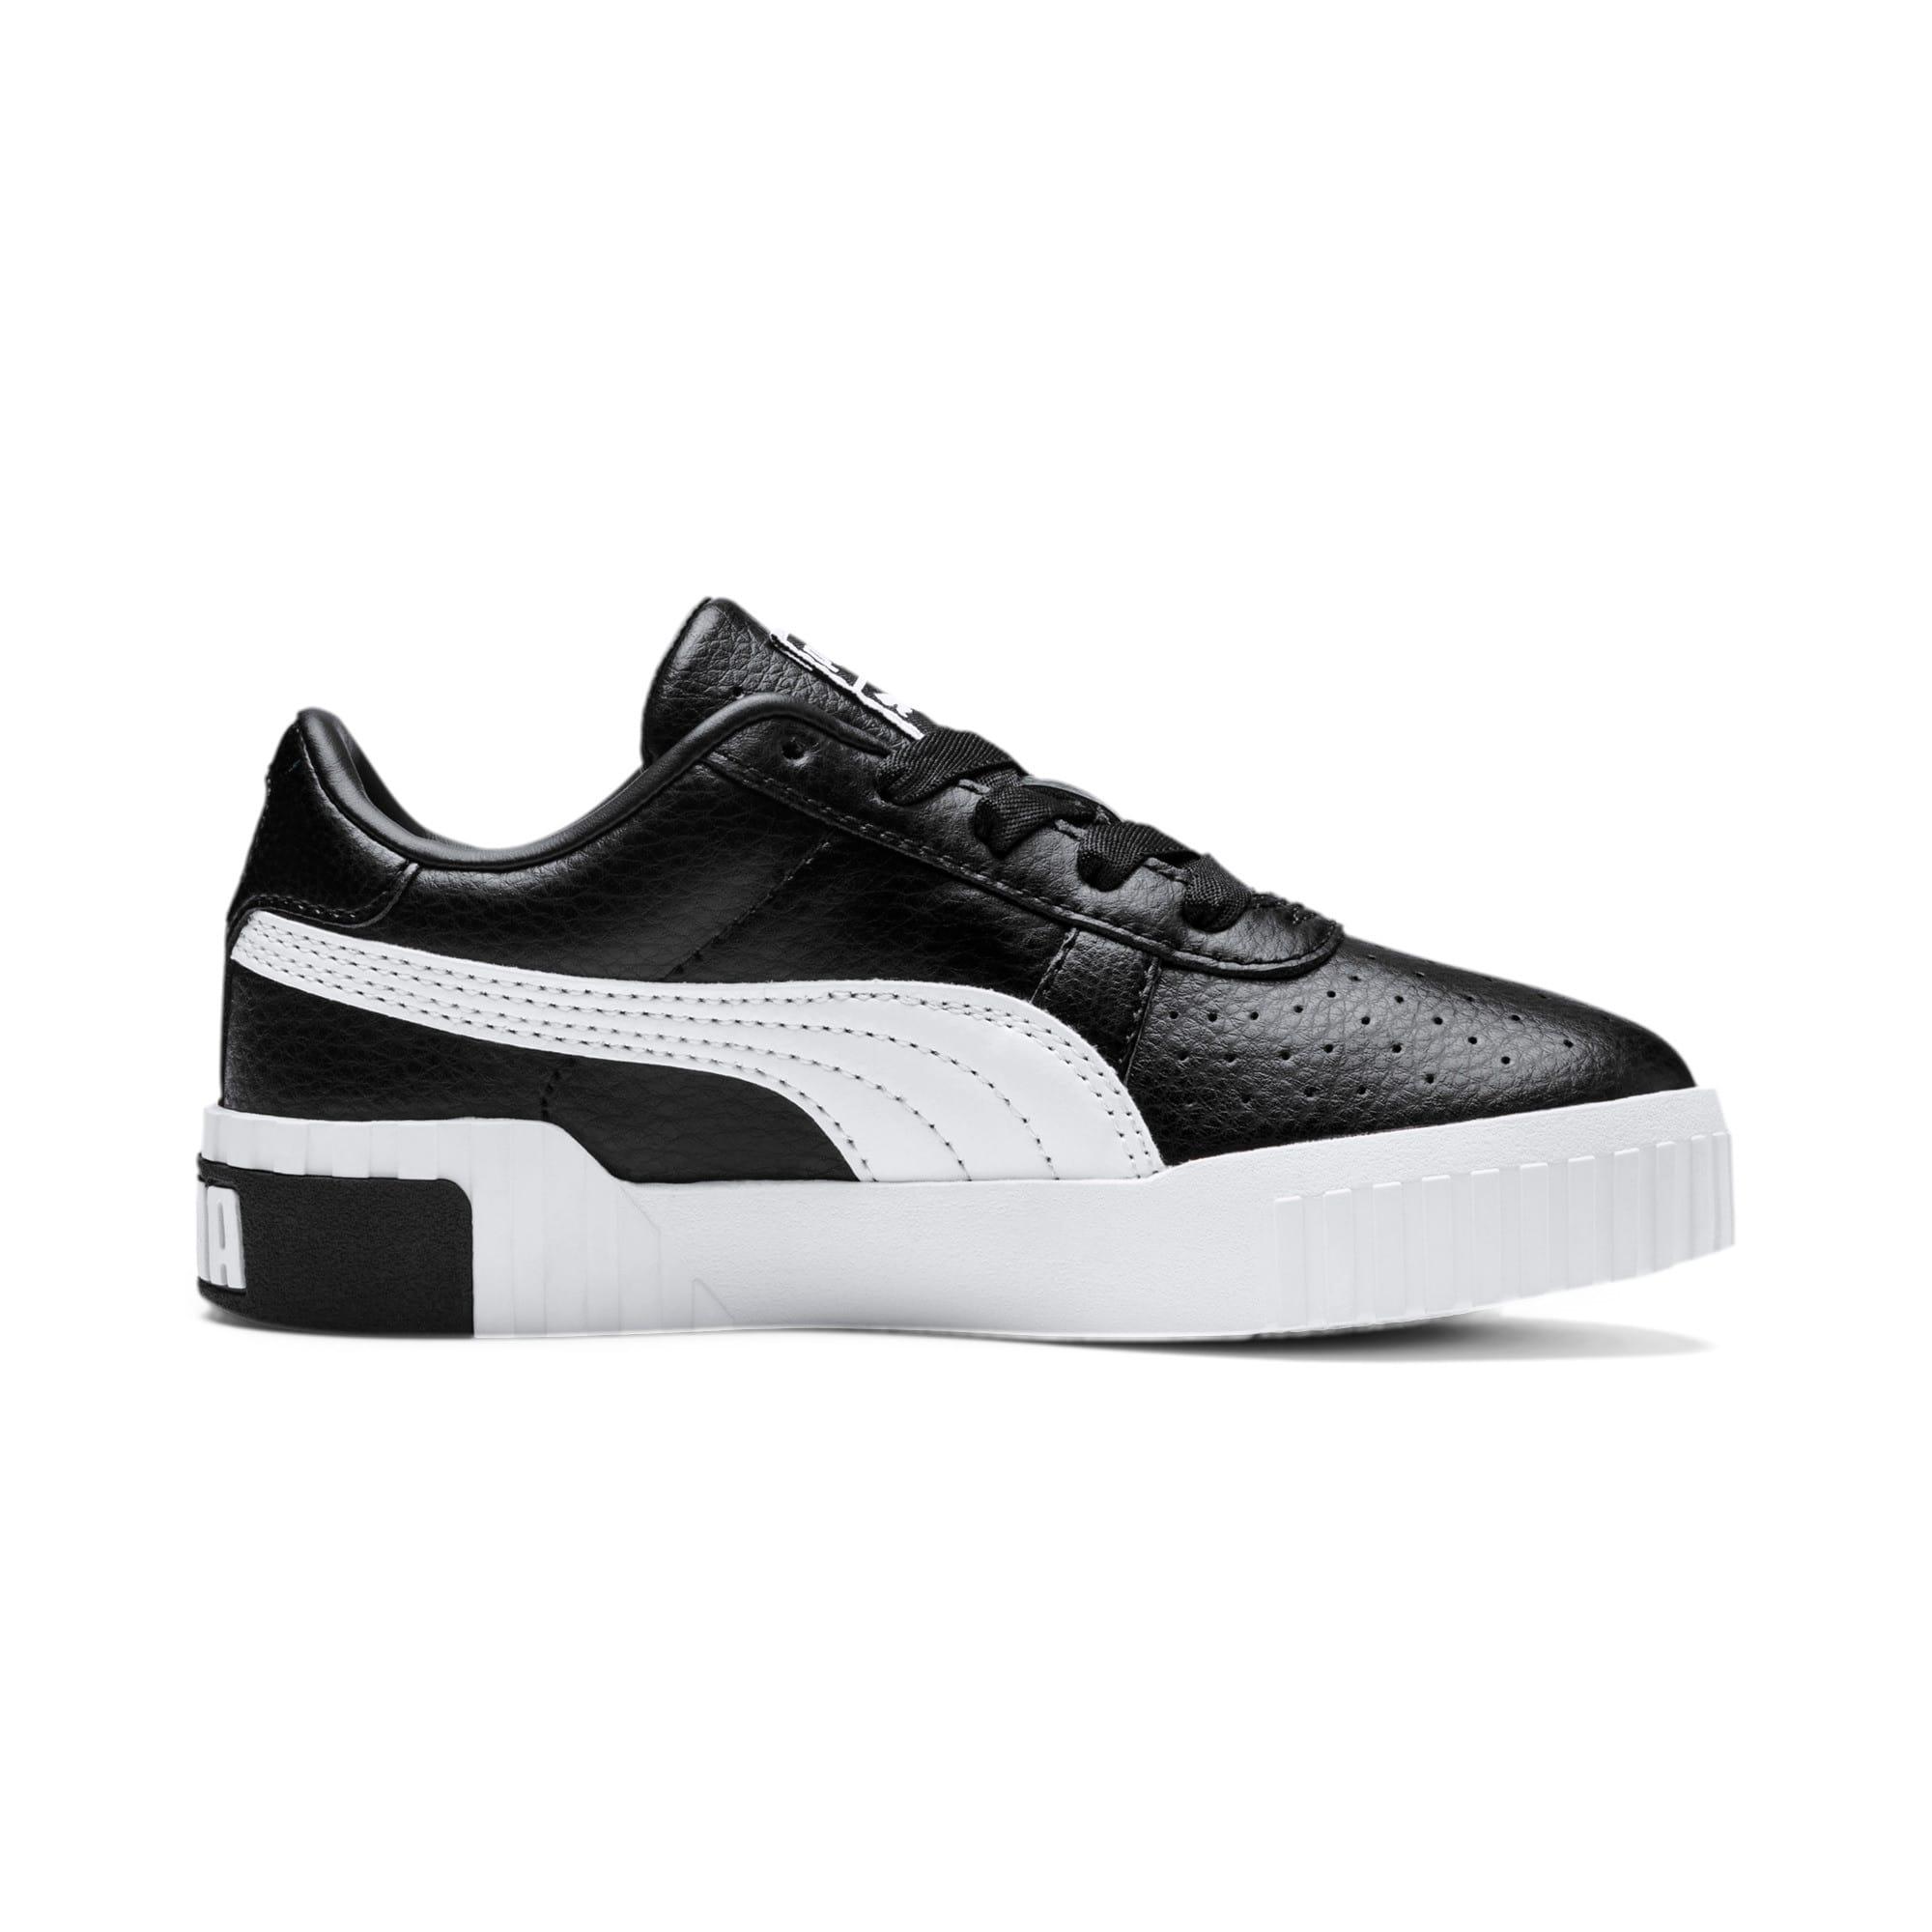 Thumbnail 5 of Cali Little Kids' Shoes, Puma Black-Puma Team Gold, medium